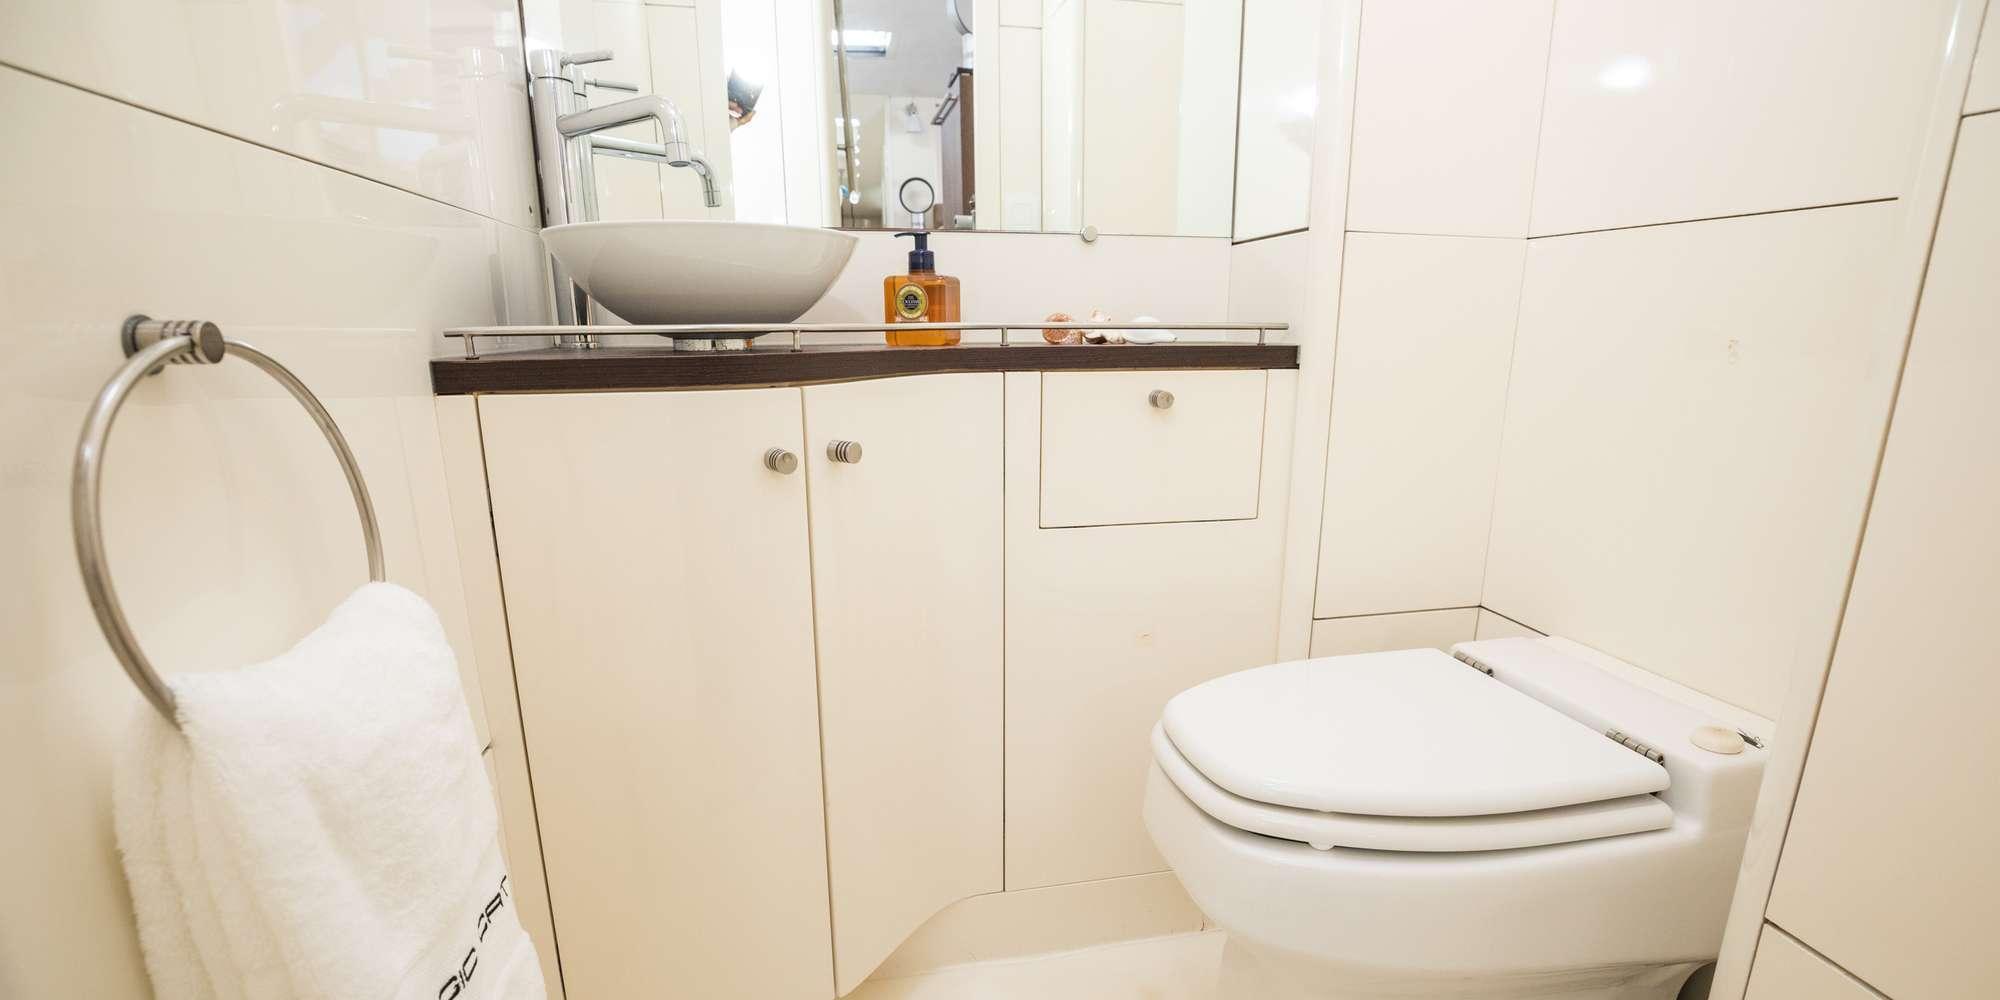 MAGIC CAT yacht image # 8